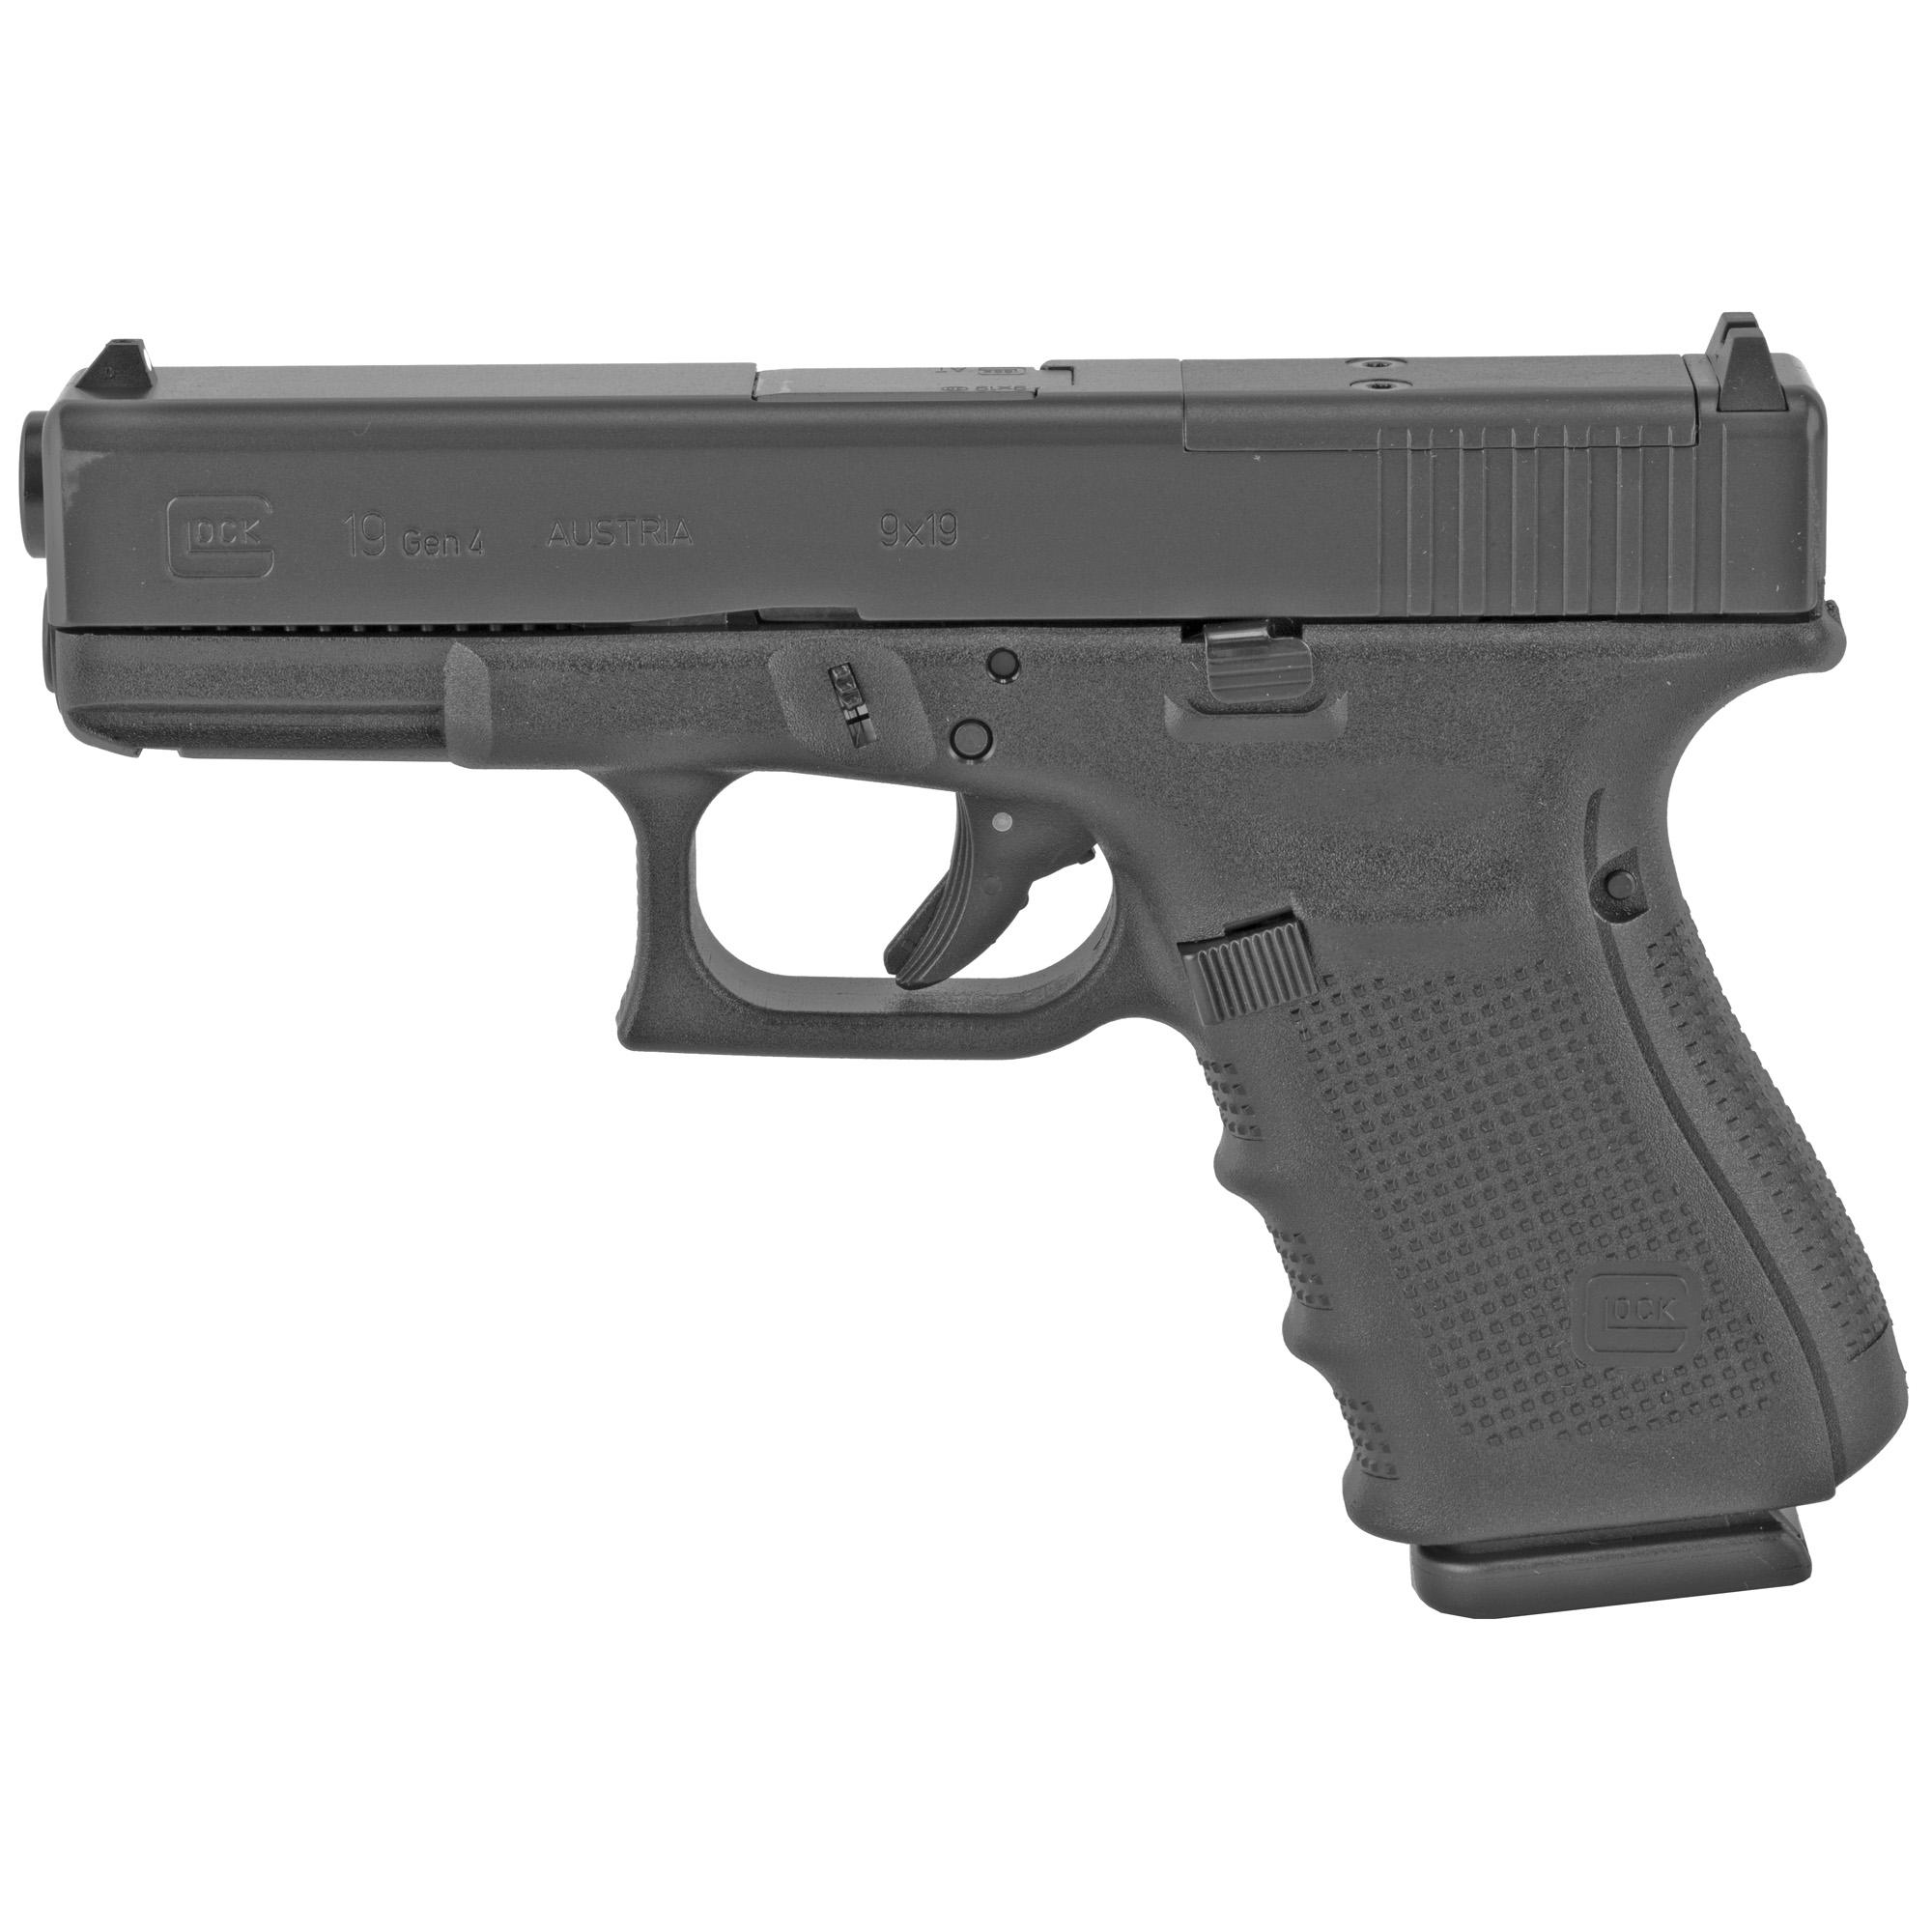 Glock 19 Gen4 9mm 15rd 3 Mags Mos